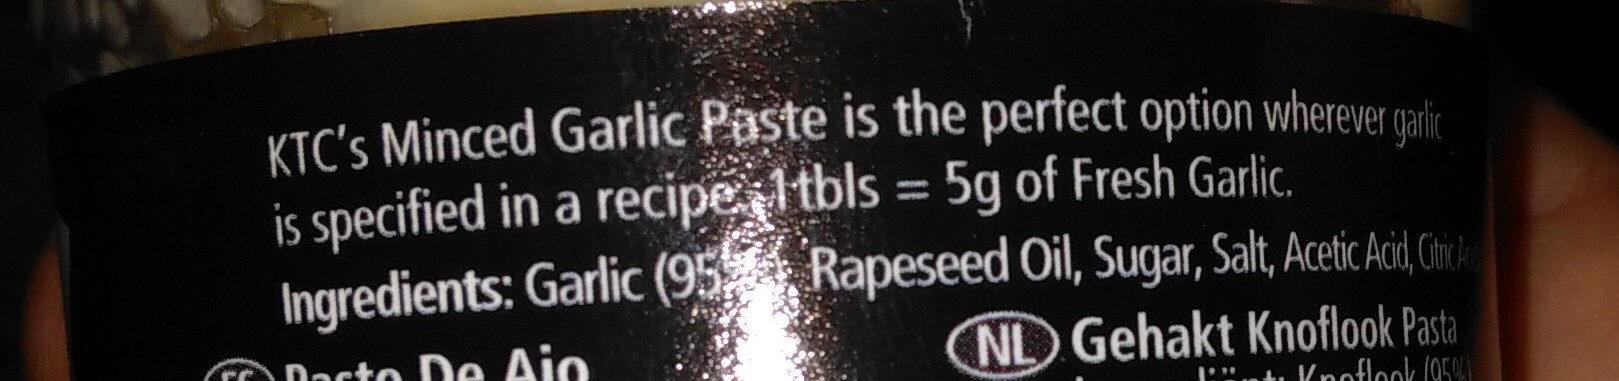 KTC Minced Garlic Paste - Ingrédients